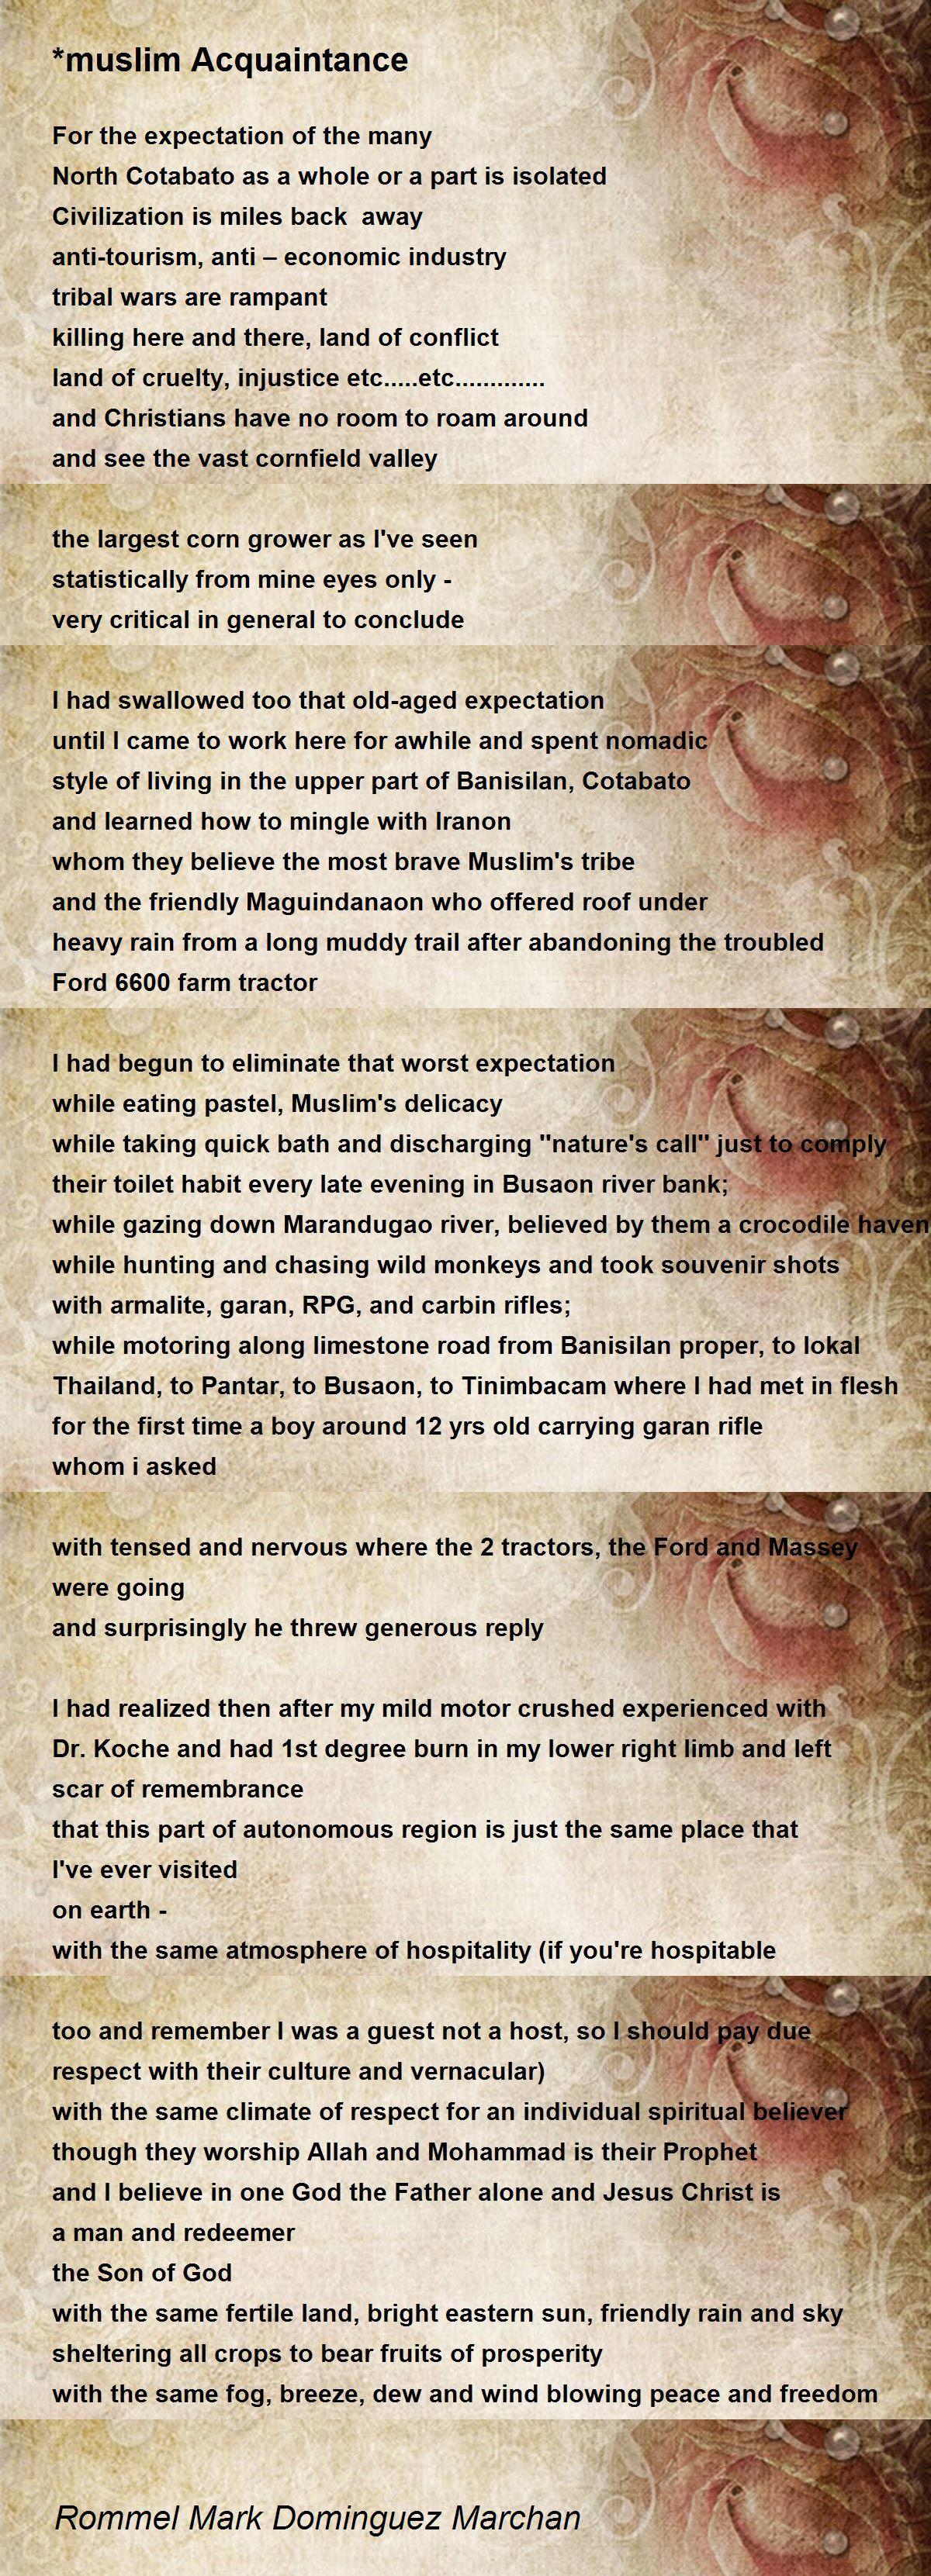 muslim Acquaintance Poem by Rommel Mark Dominguez Marchan - Poem Hunter